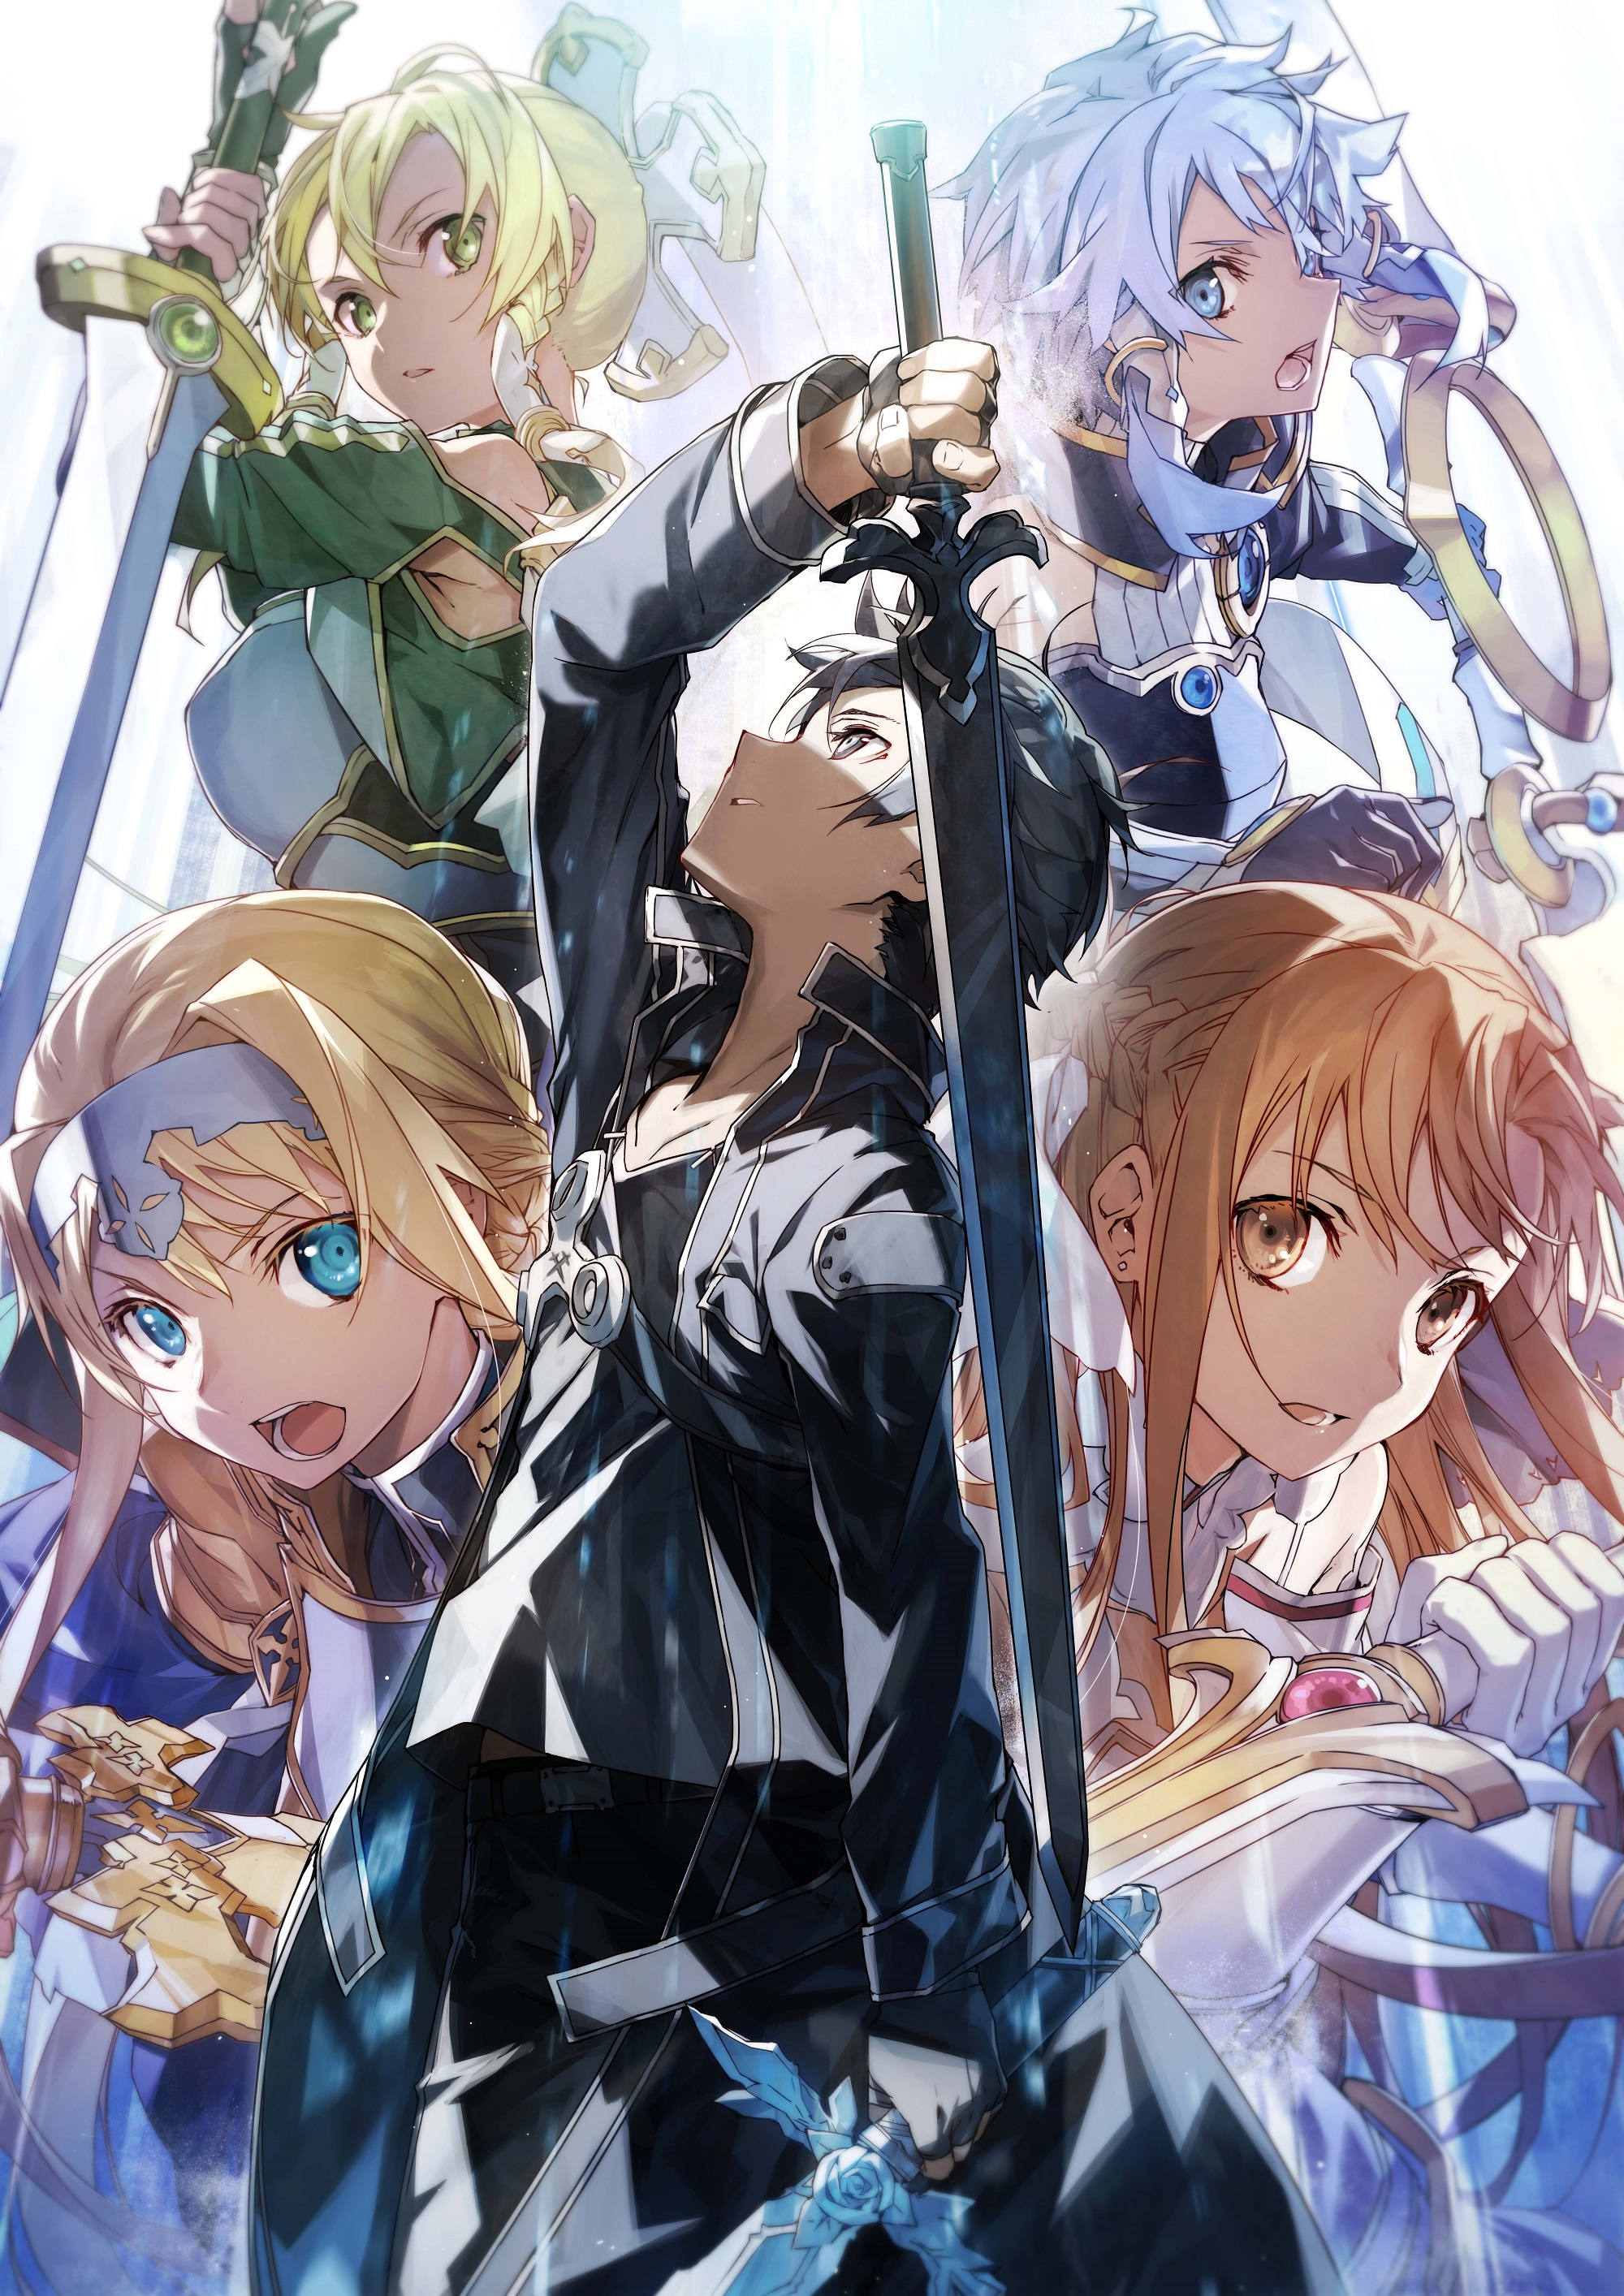 Anime 2000x2828 anime novel Sword Art Online Kirigaya Kazuto Kirigaya Suguha Yuuki Asuna Asada Shino Alice Zuberg